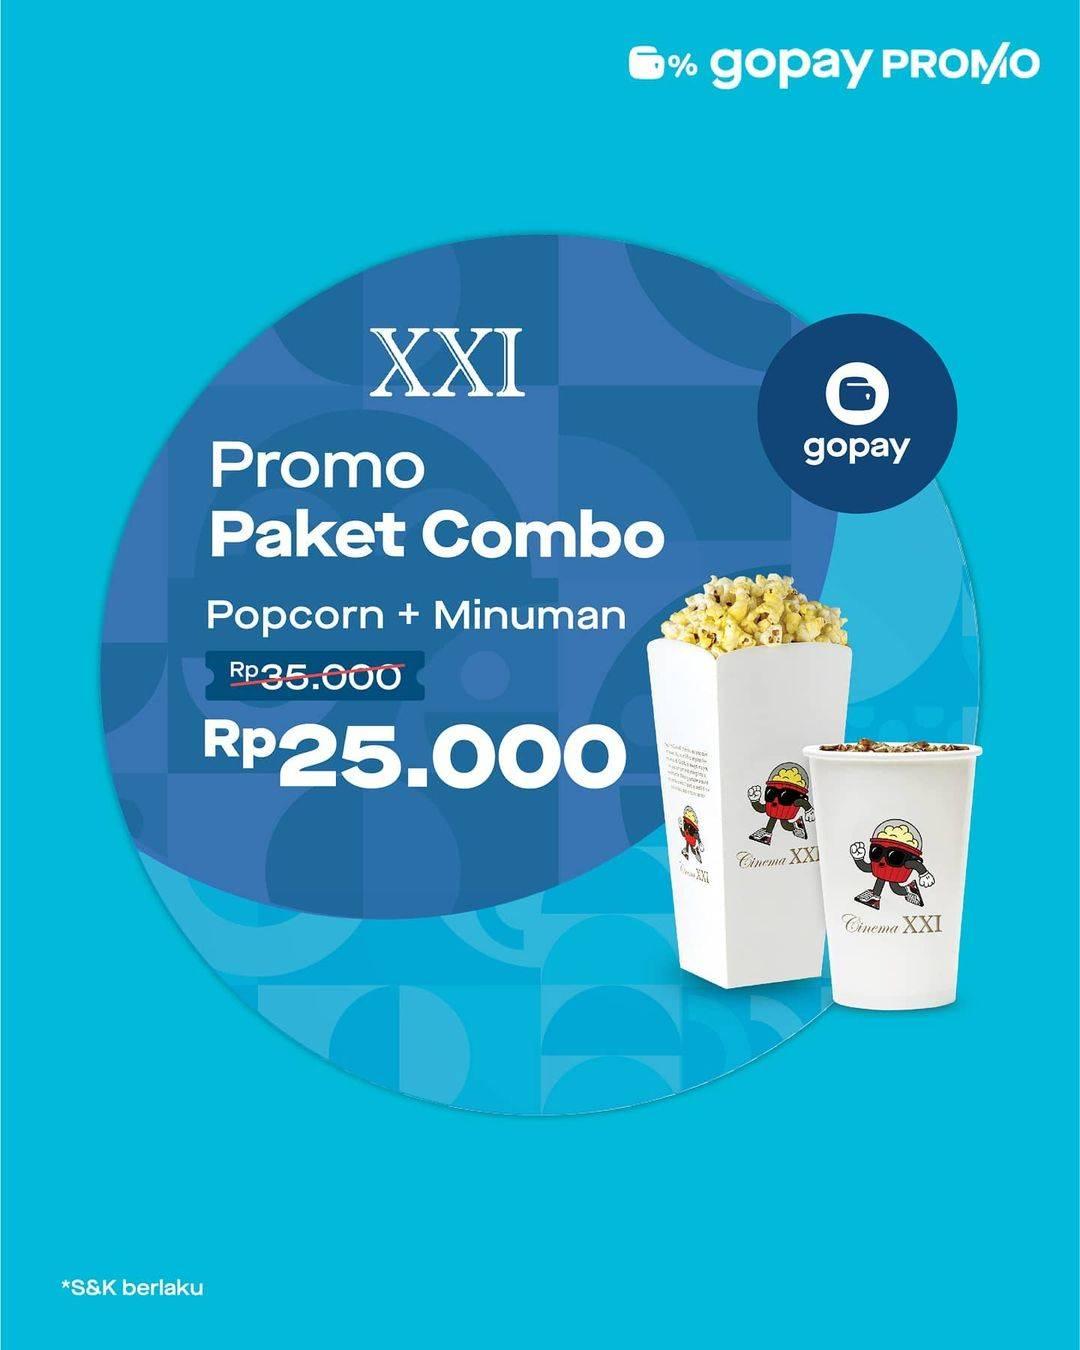 Diskon XXI Promo Paket Combo Popcorn + Minuman Hanya Rp. 25.000 Dengan Gopay